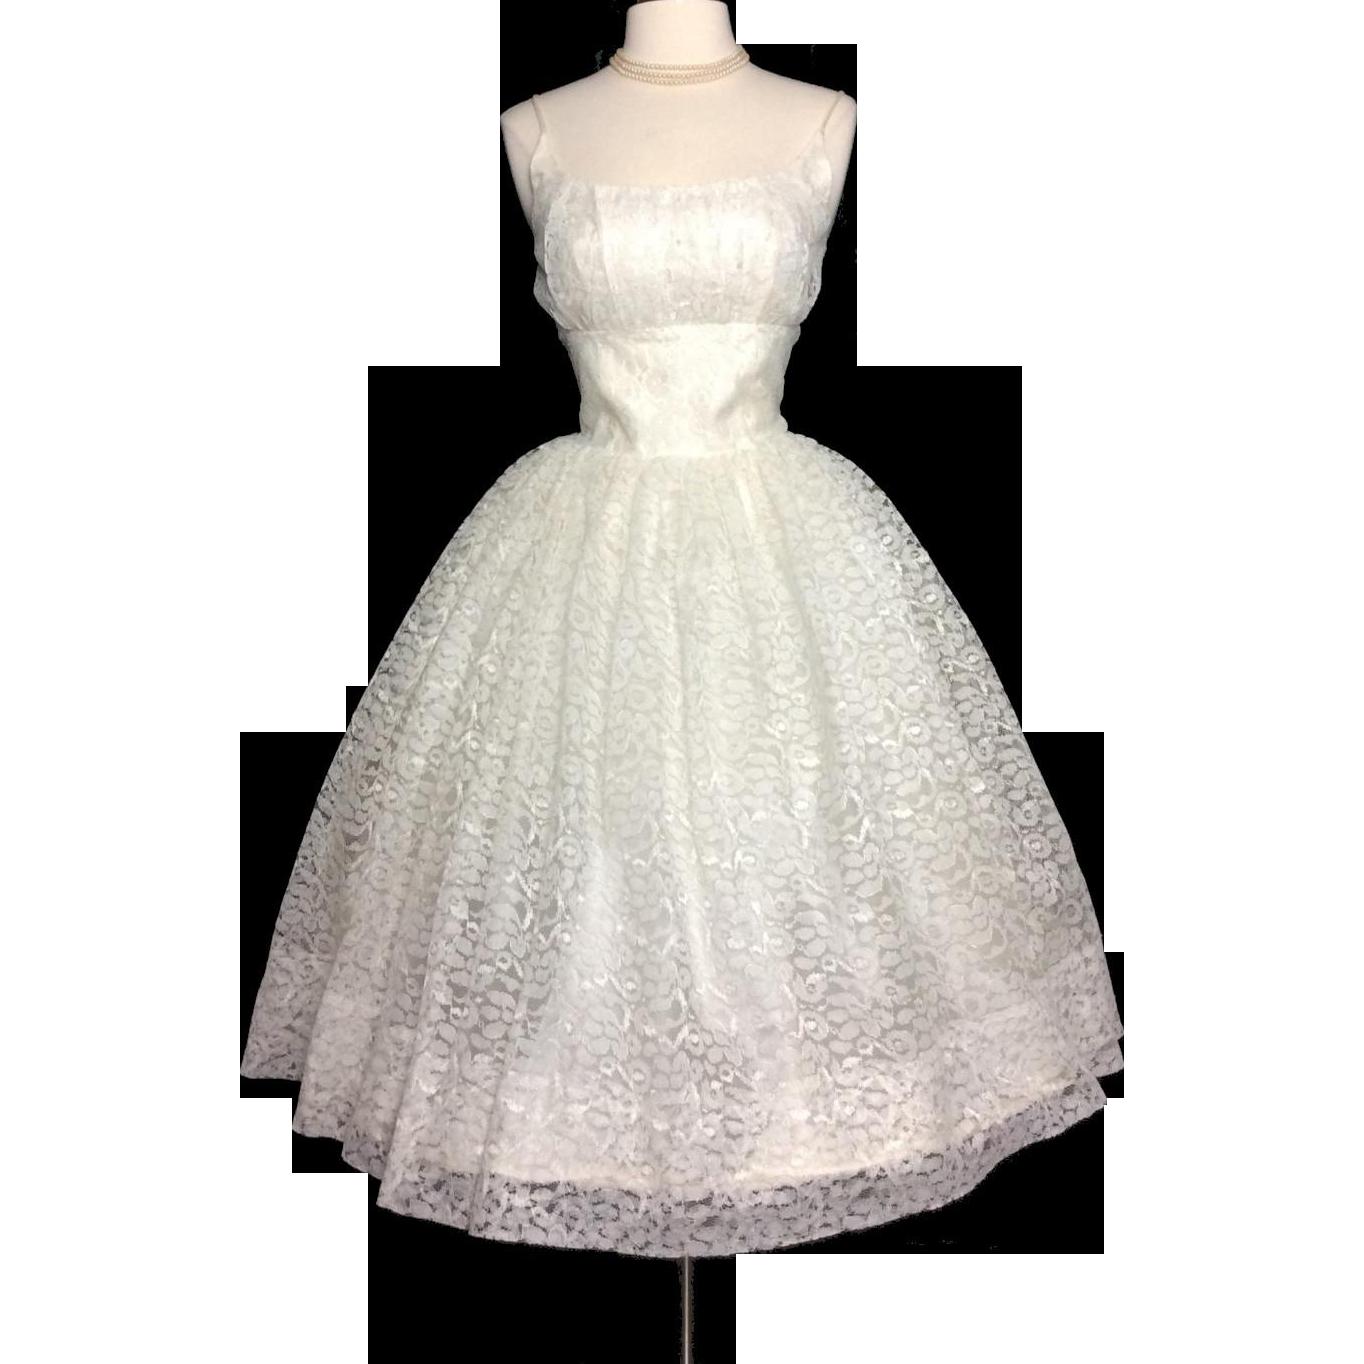 Vintage s dress white lace s dress new look femme